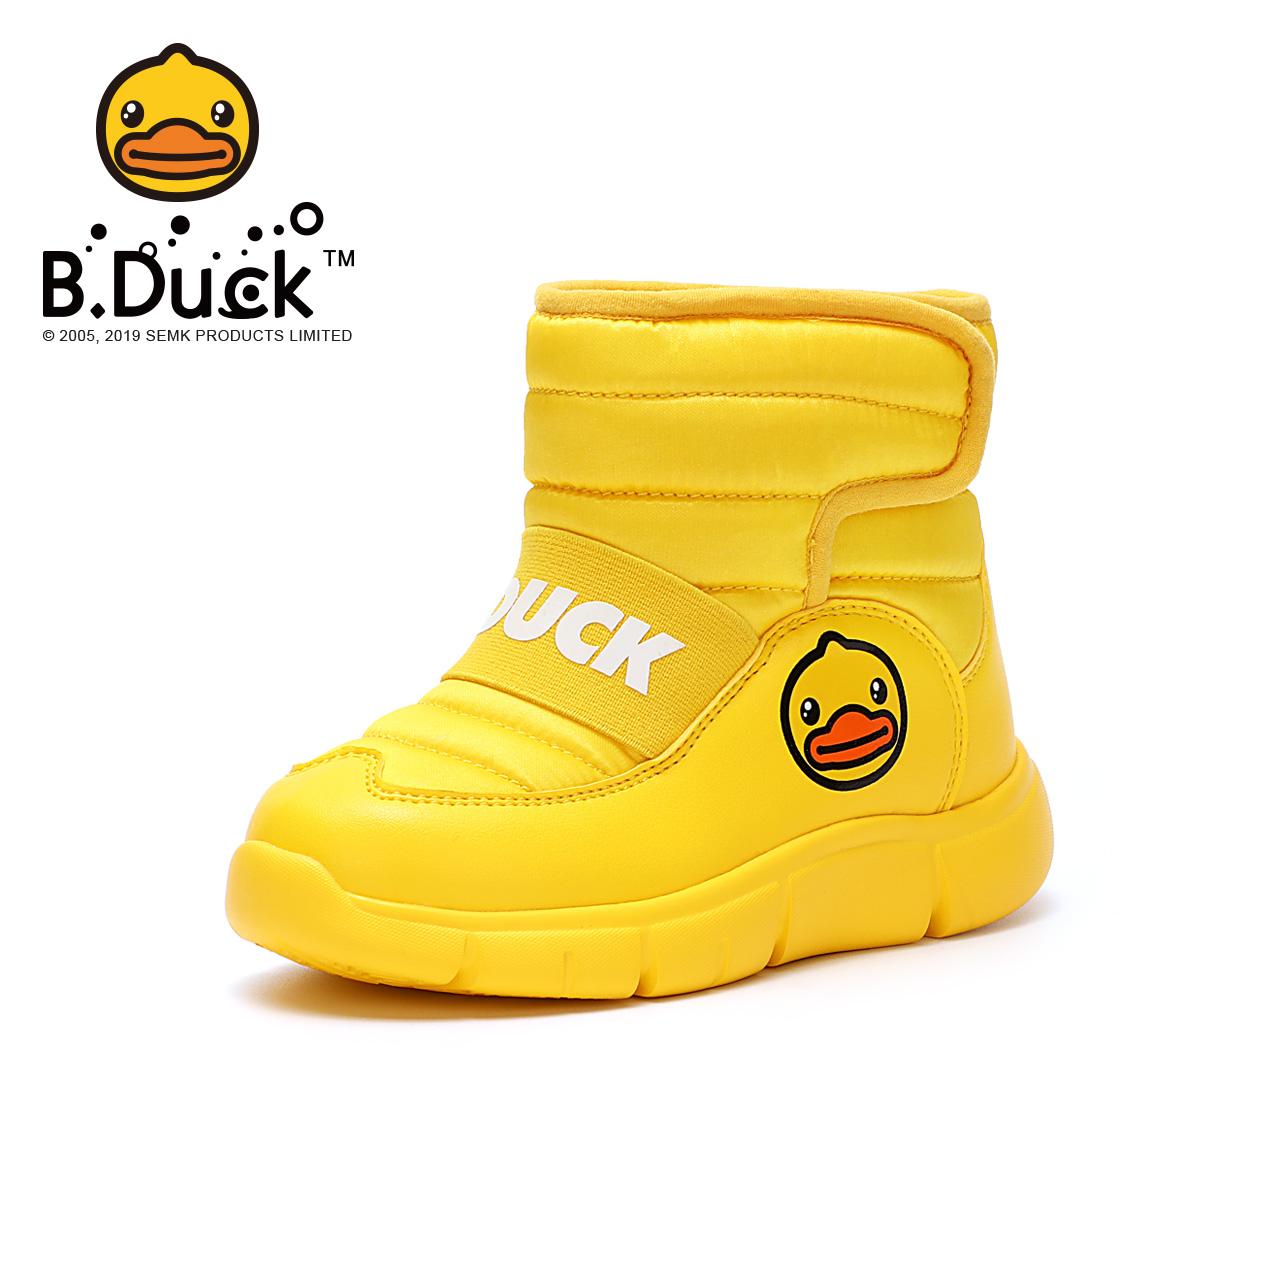 B.Duck小黄鸭男童棉靴2020冬季儿童加绒保暖雪地靴品牌加厚短靴潮